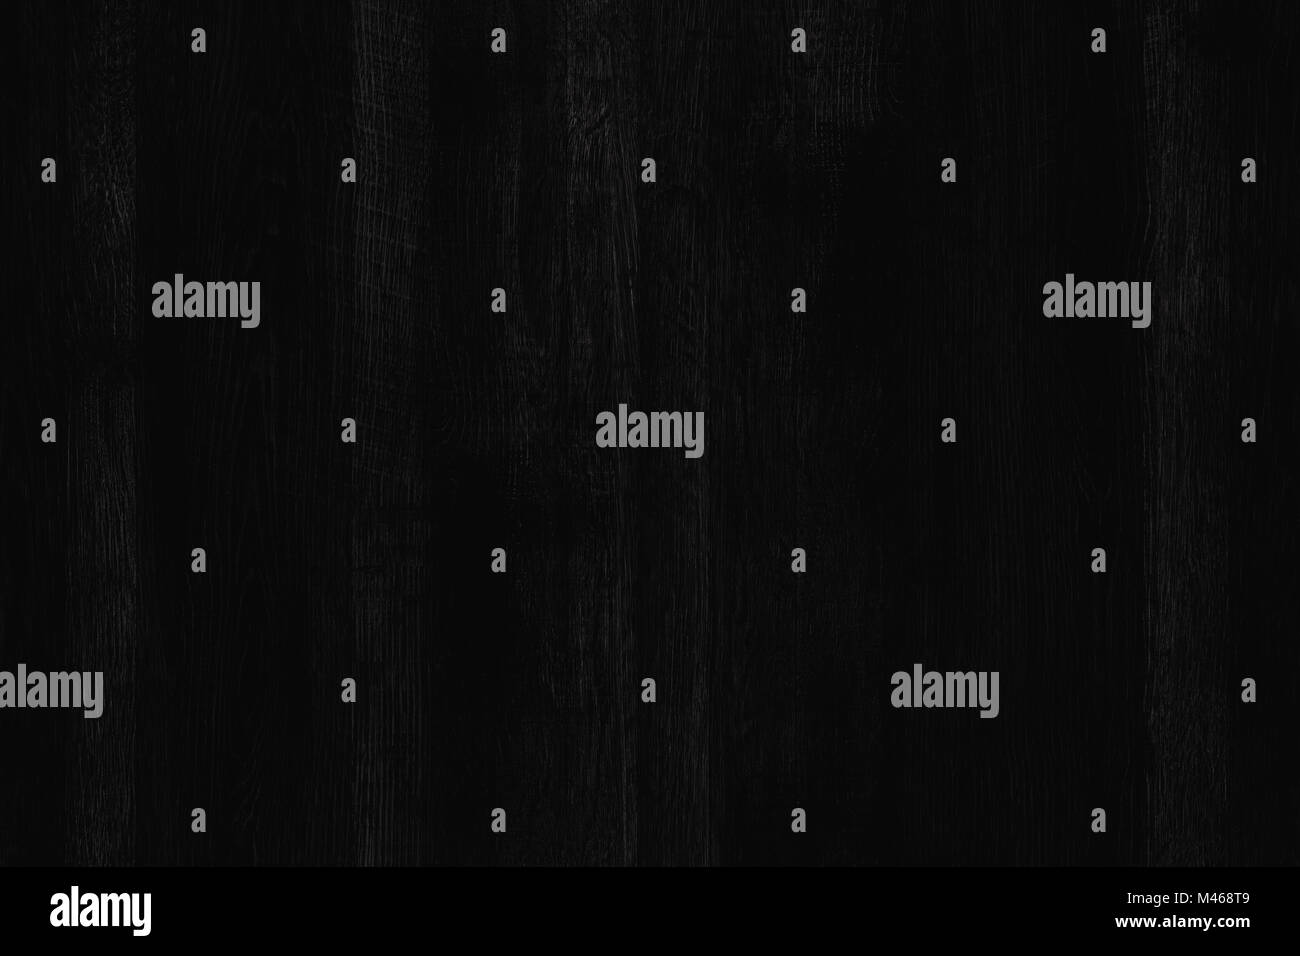 Black grunge wood panels. Planks Background. old wall wooden floor vintage - Stock Image